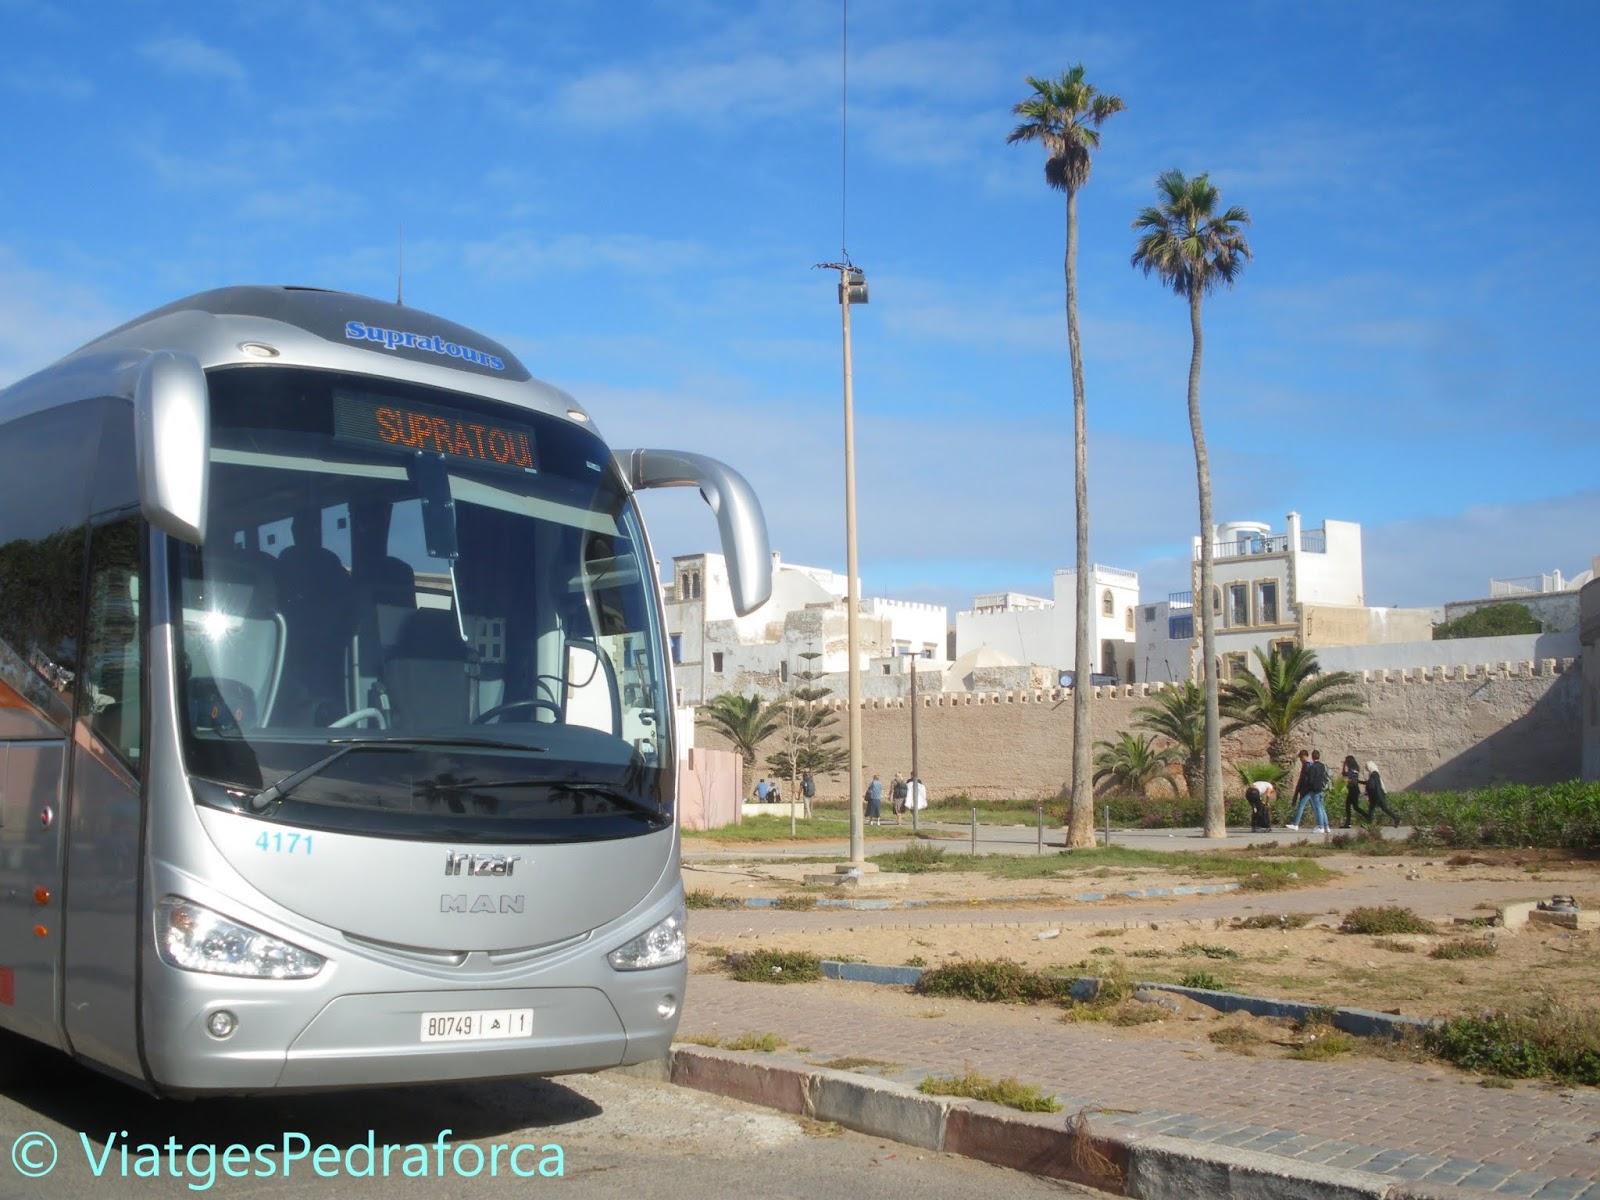 Patrimoni de la Humanitat, Unesco Heritage, Marroc